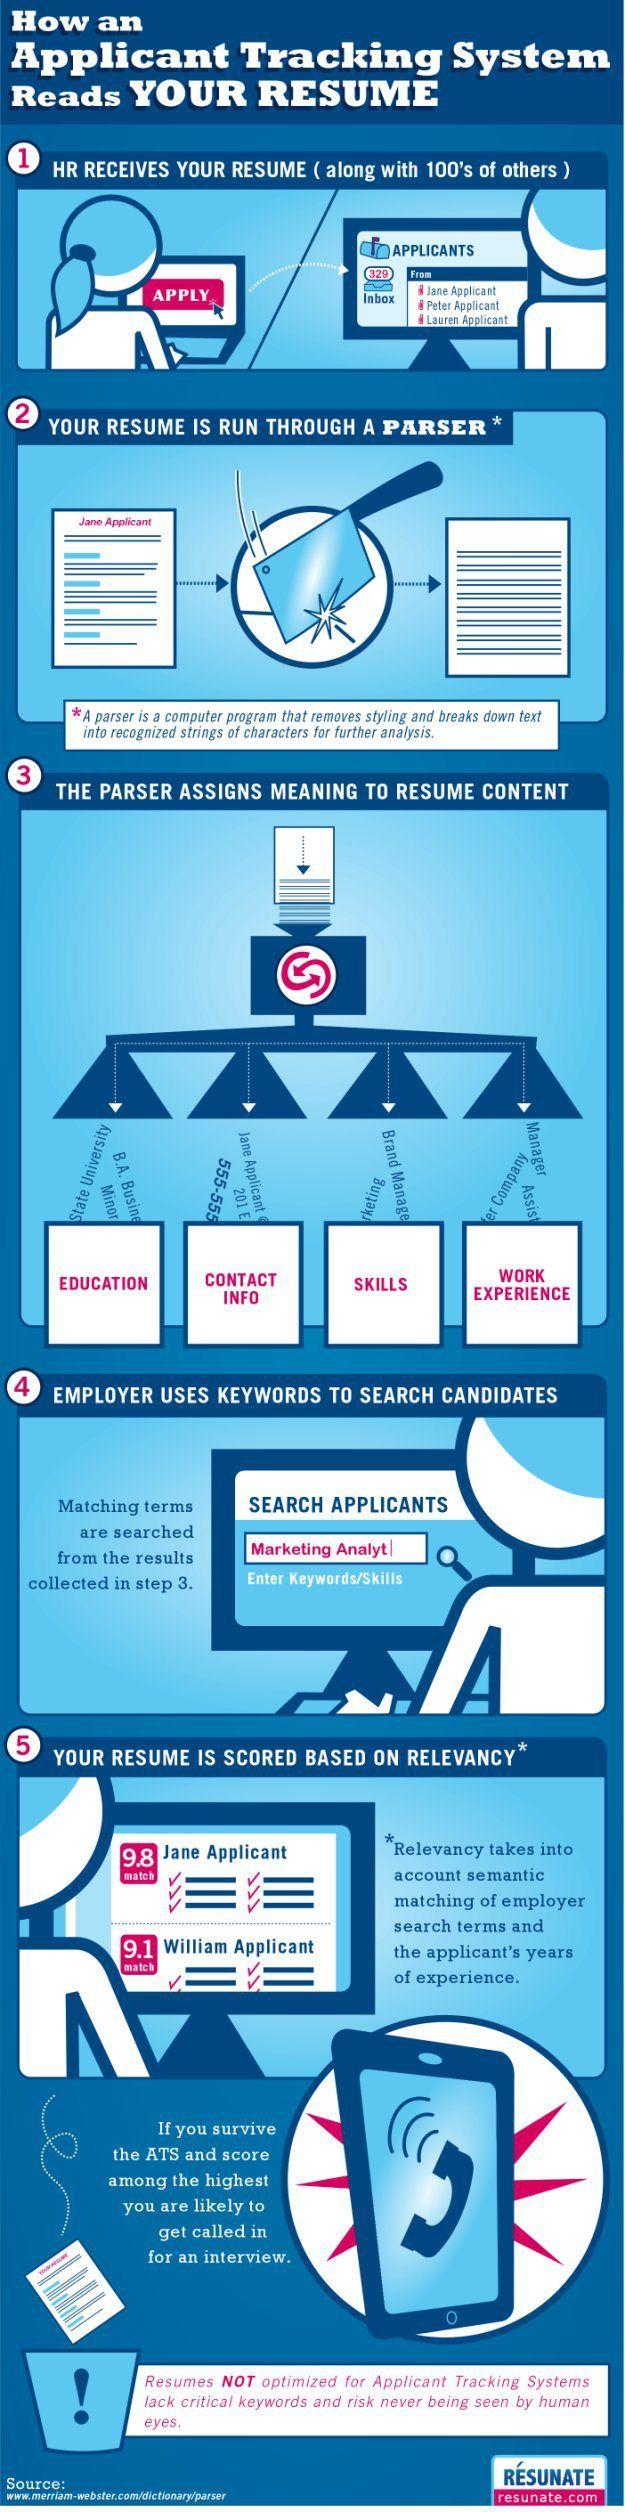 Resume Screening Software 47 Best Careerin Images On Pinterest  Career Leadership And Resume